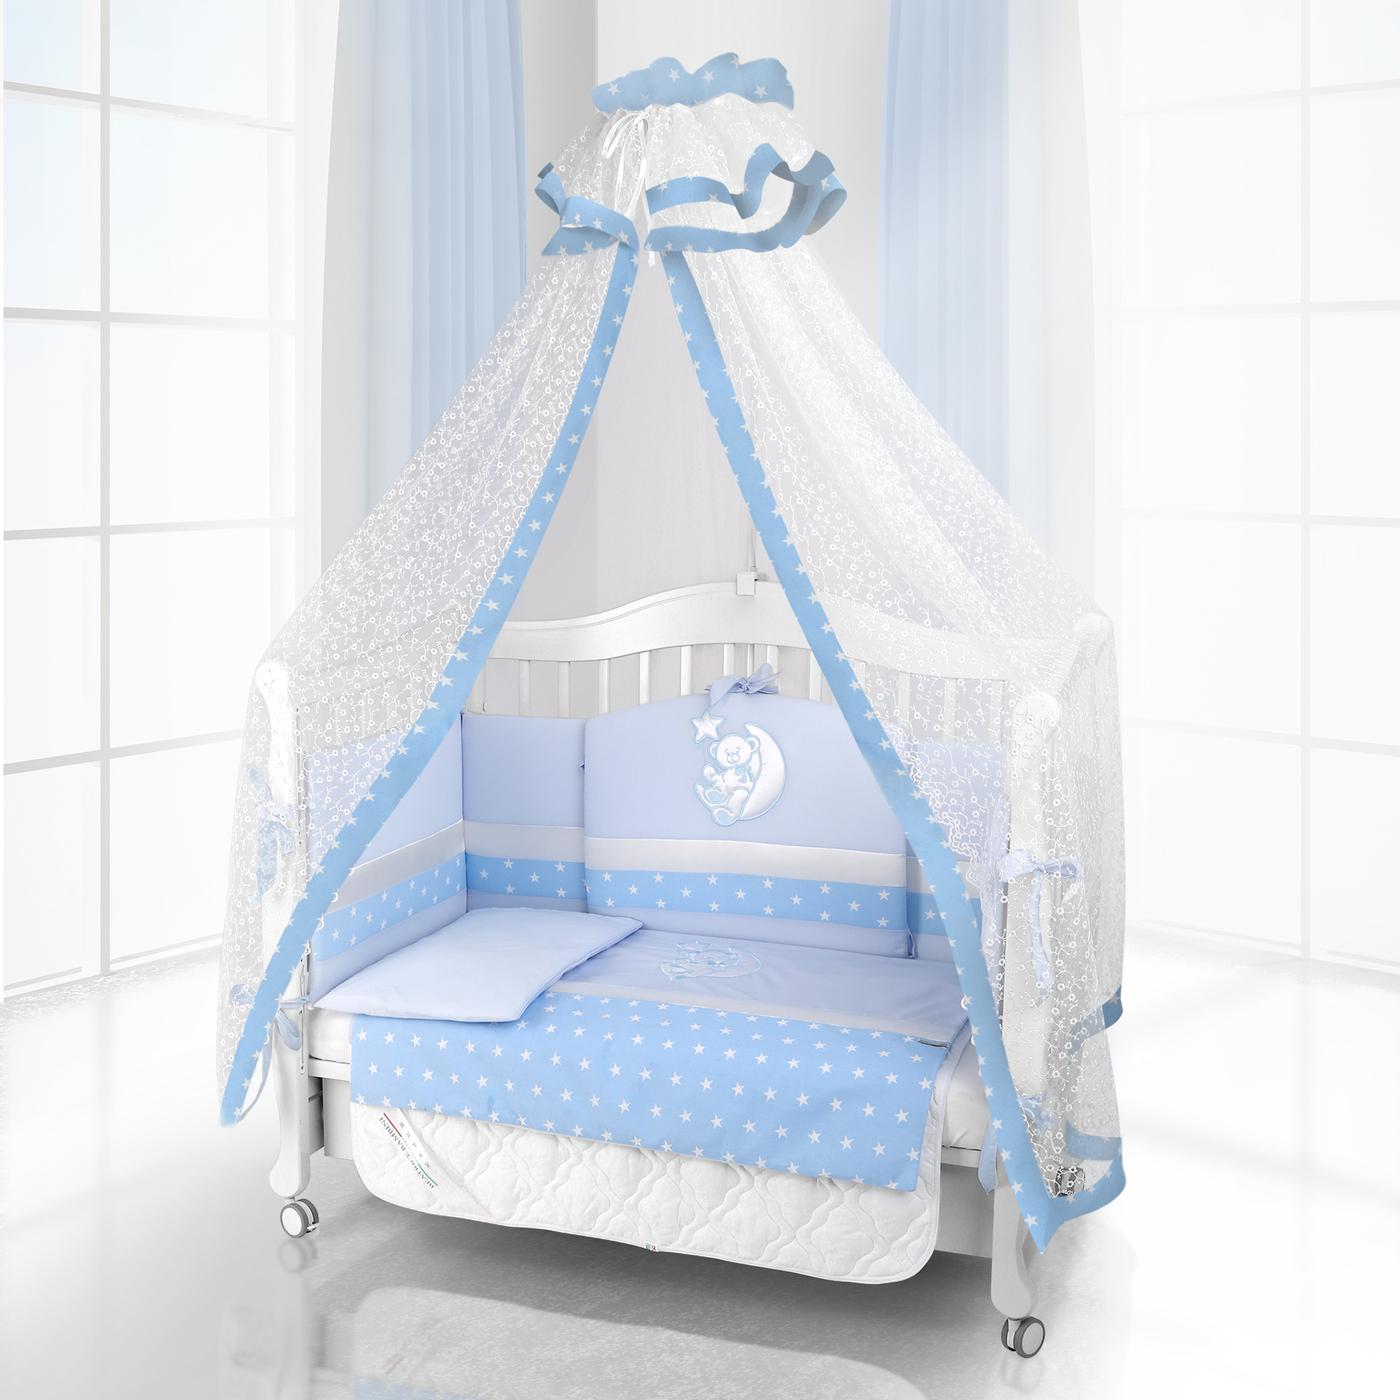 Комплект постельного белья Beatrice Bambini Unico Stella (125х65) - blu& blu